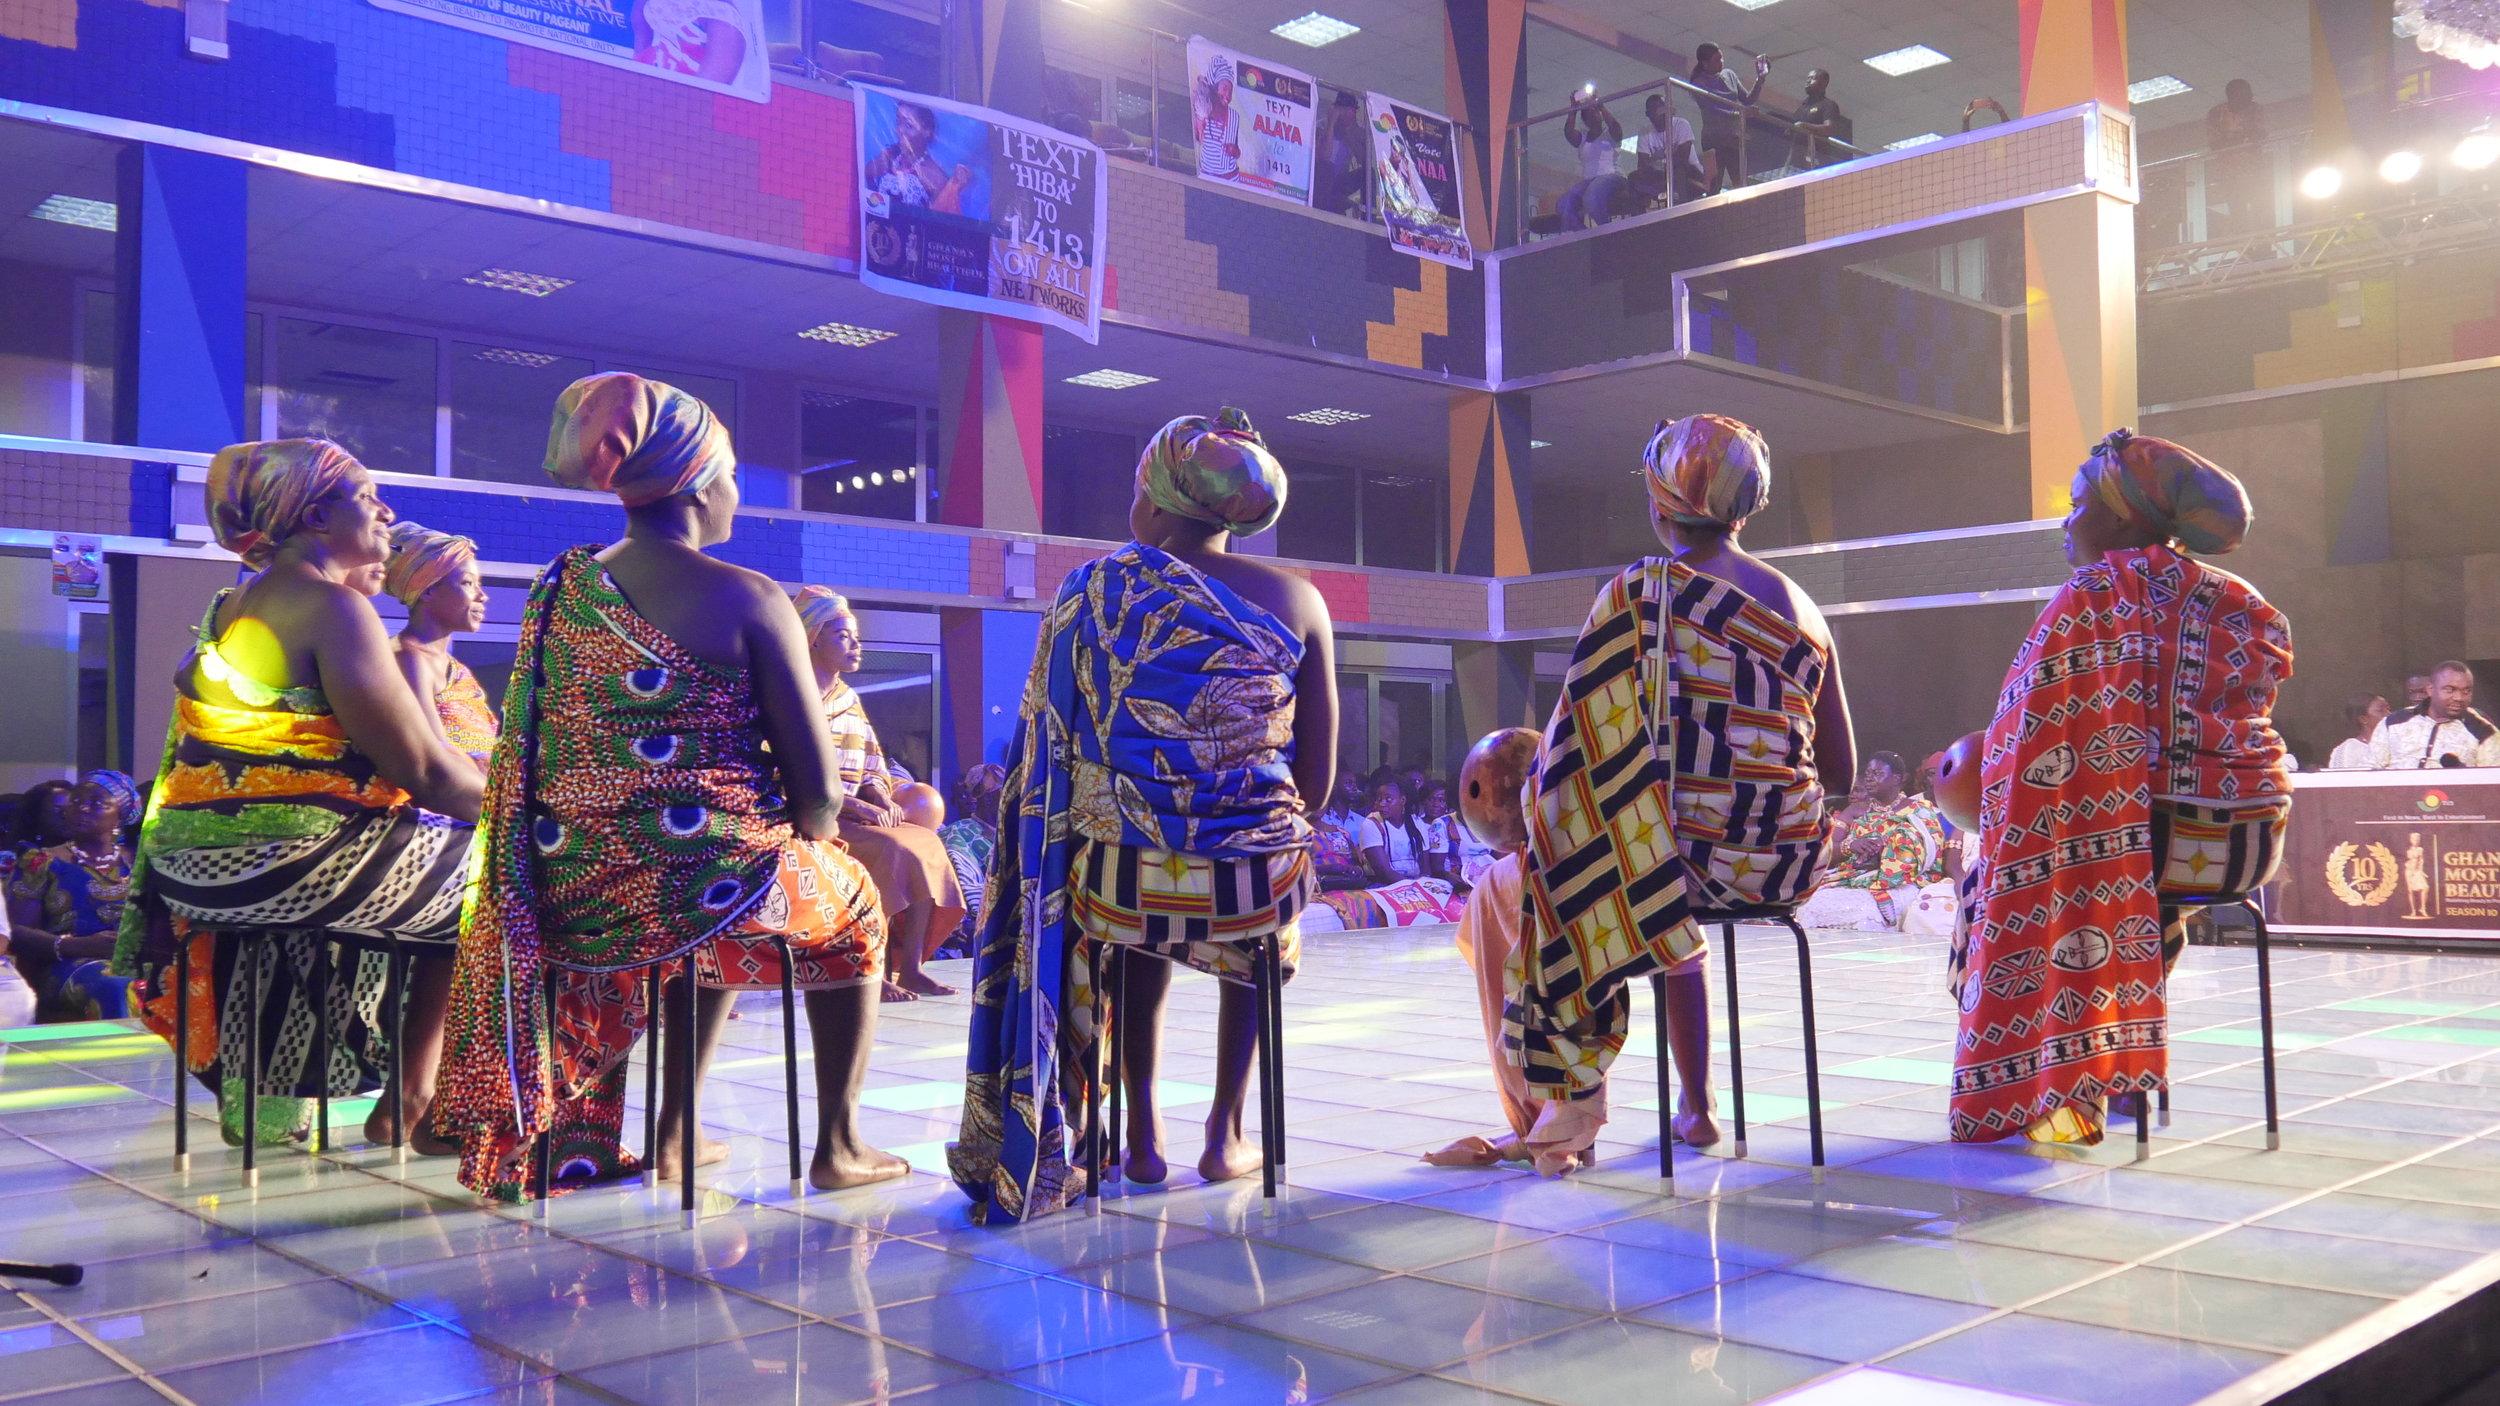 Elders Seated at Ghana's Most Beautiful TV Show Photo by Cari Ann Shim Sham